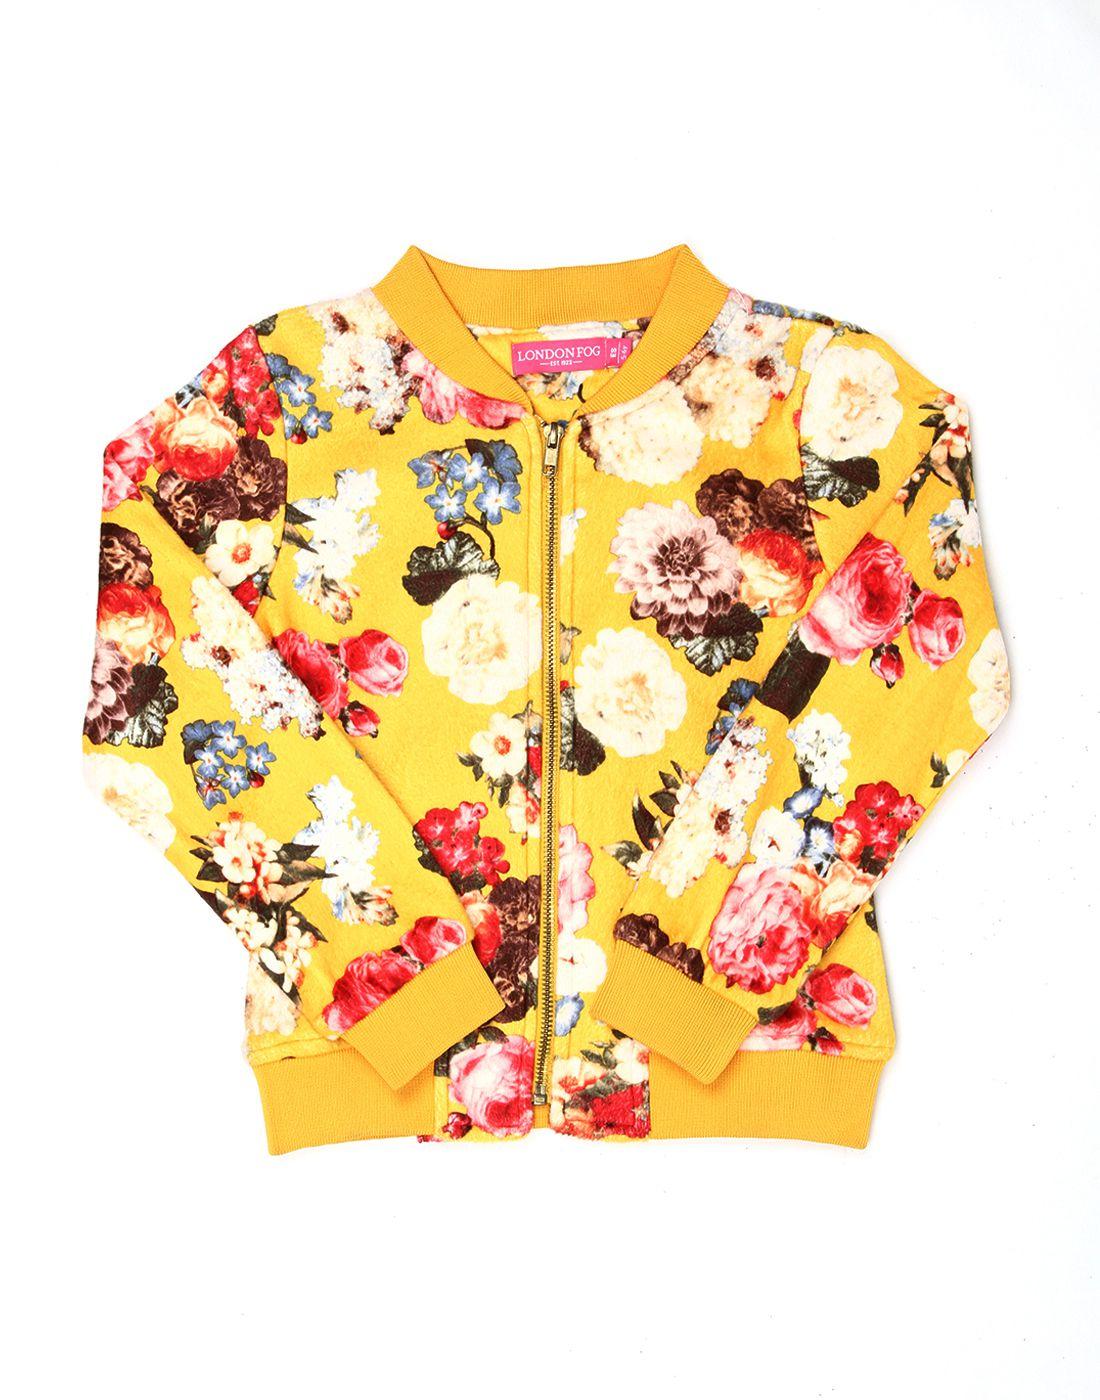 London Fog Girls Multi / Yellow Full Sleeve Jacket